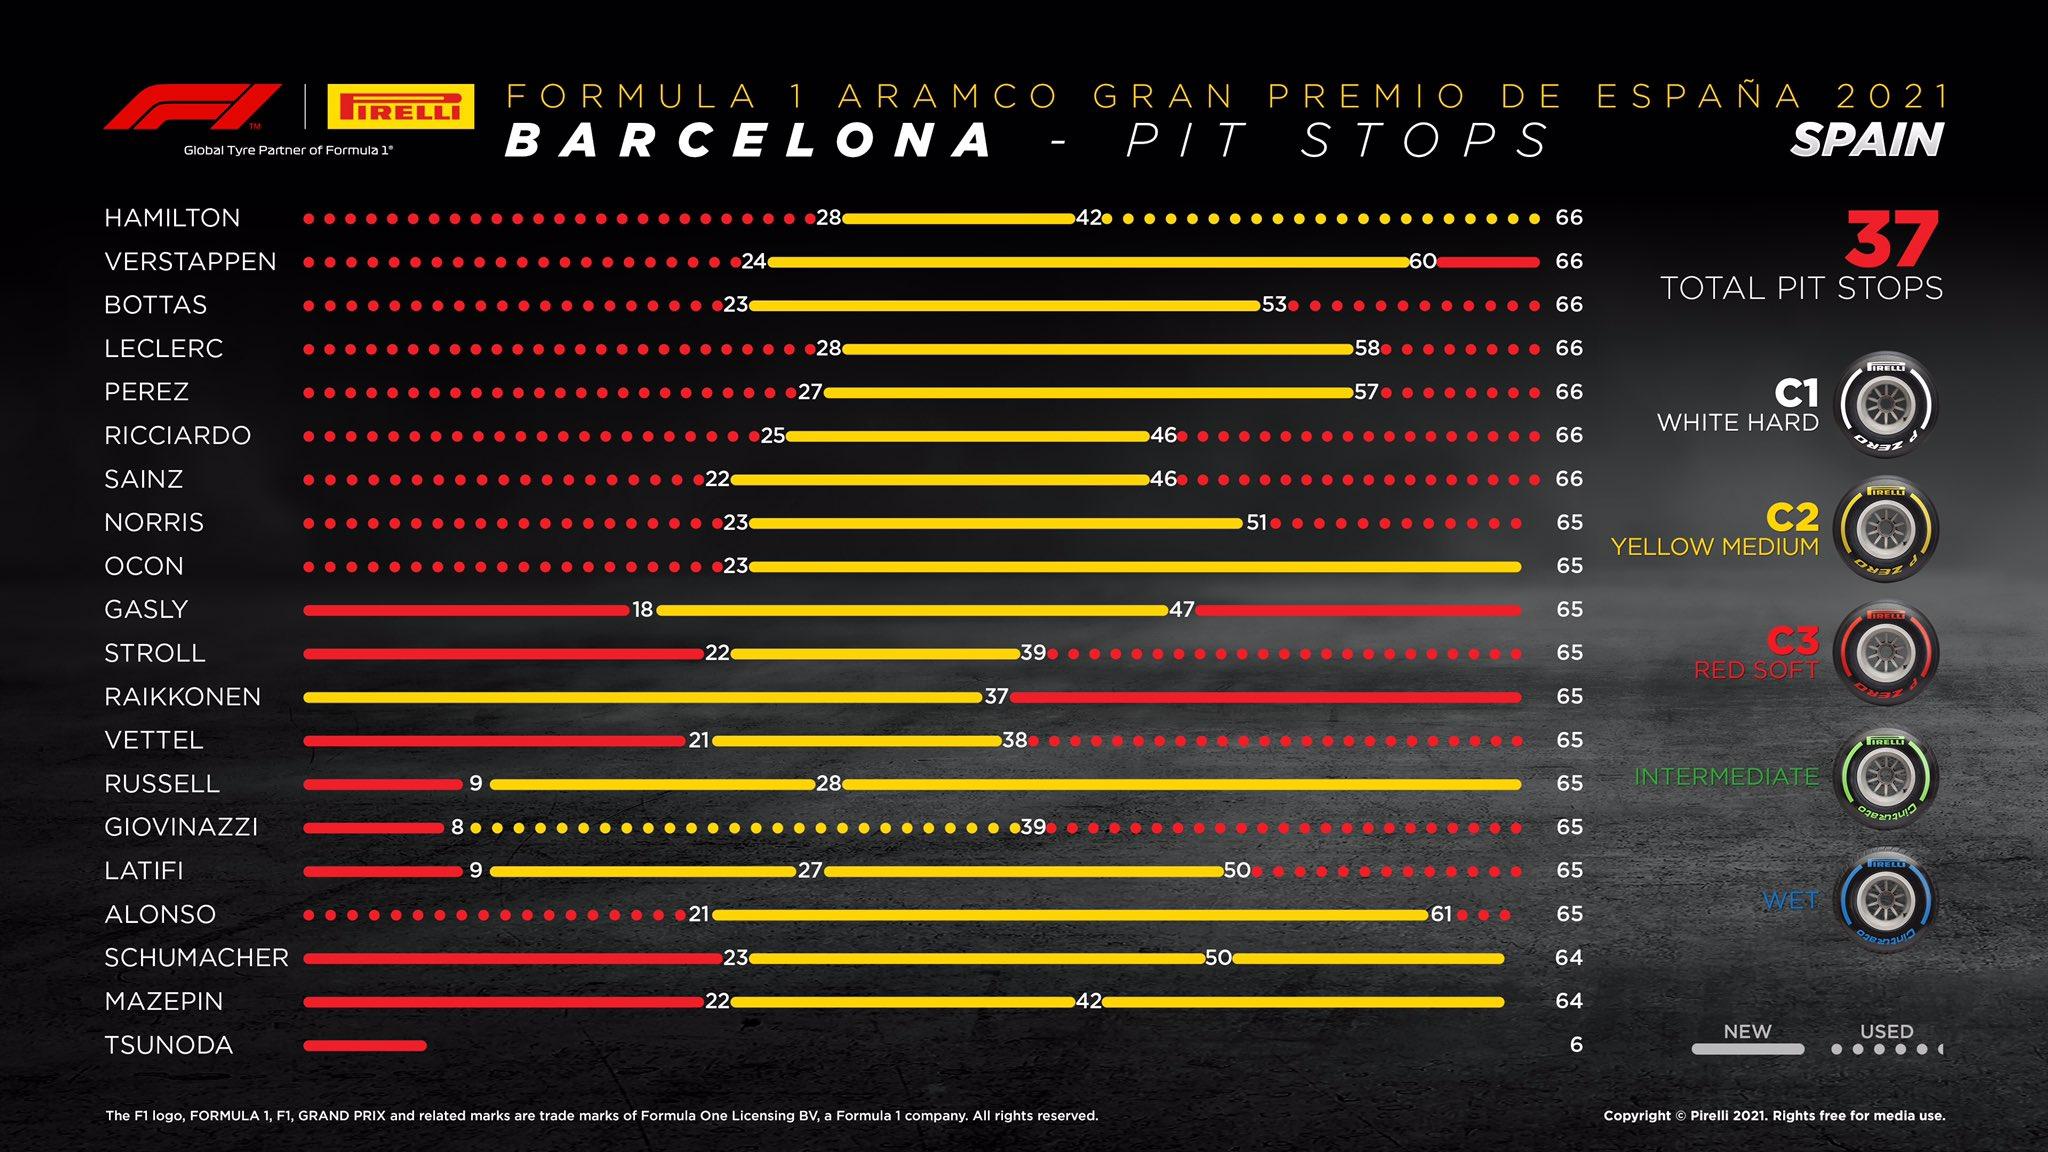 Gp Spagna 2021 - Analisi Strategica: